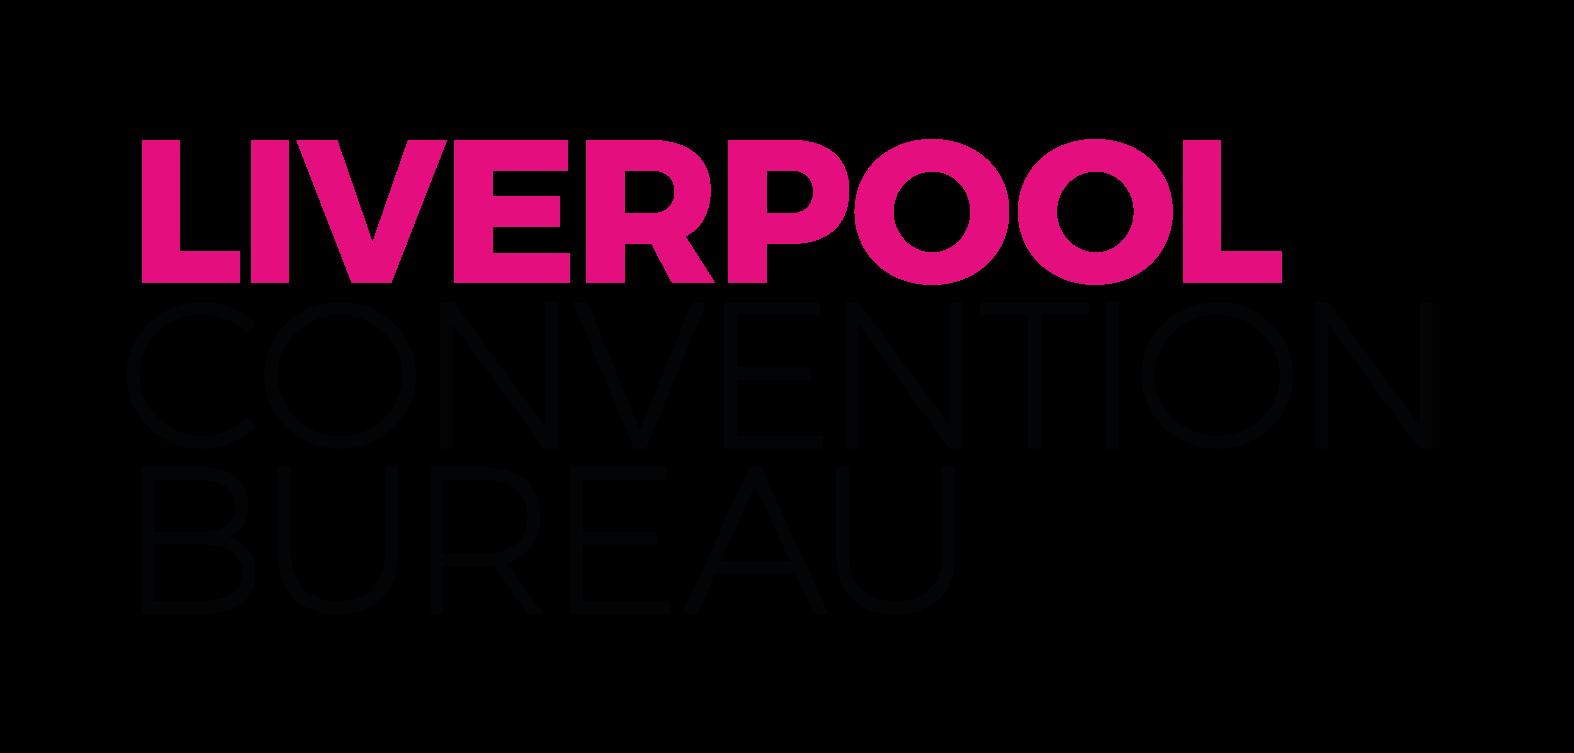 Liverpool Convention Bureau